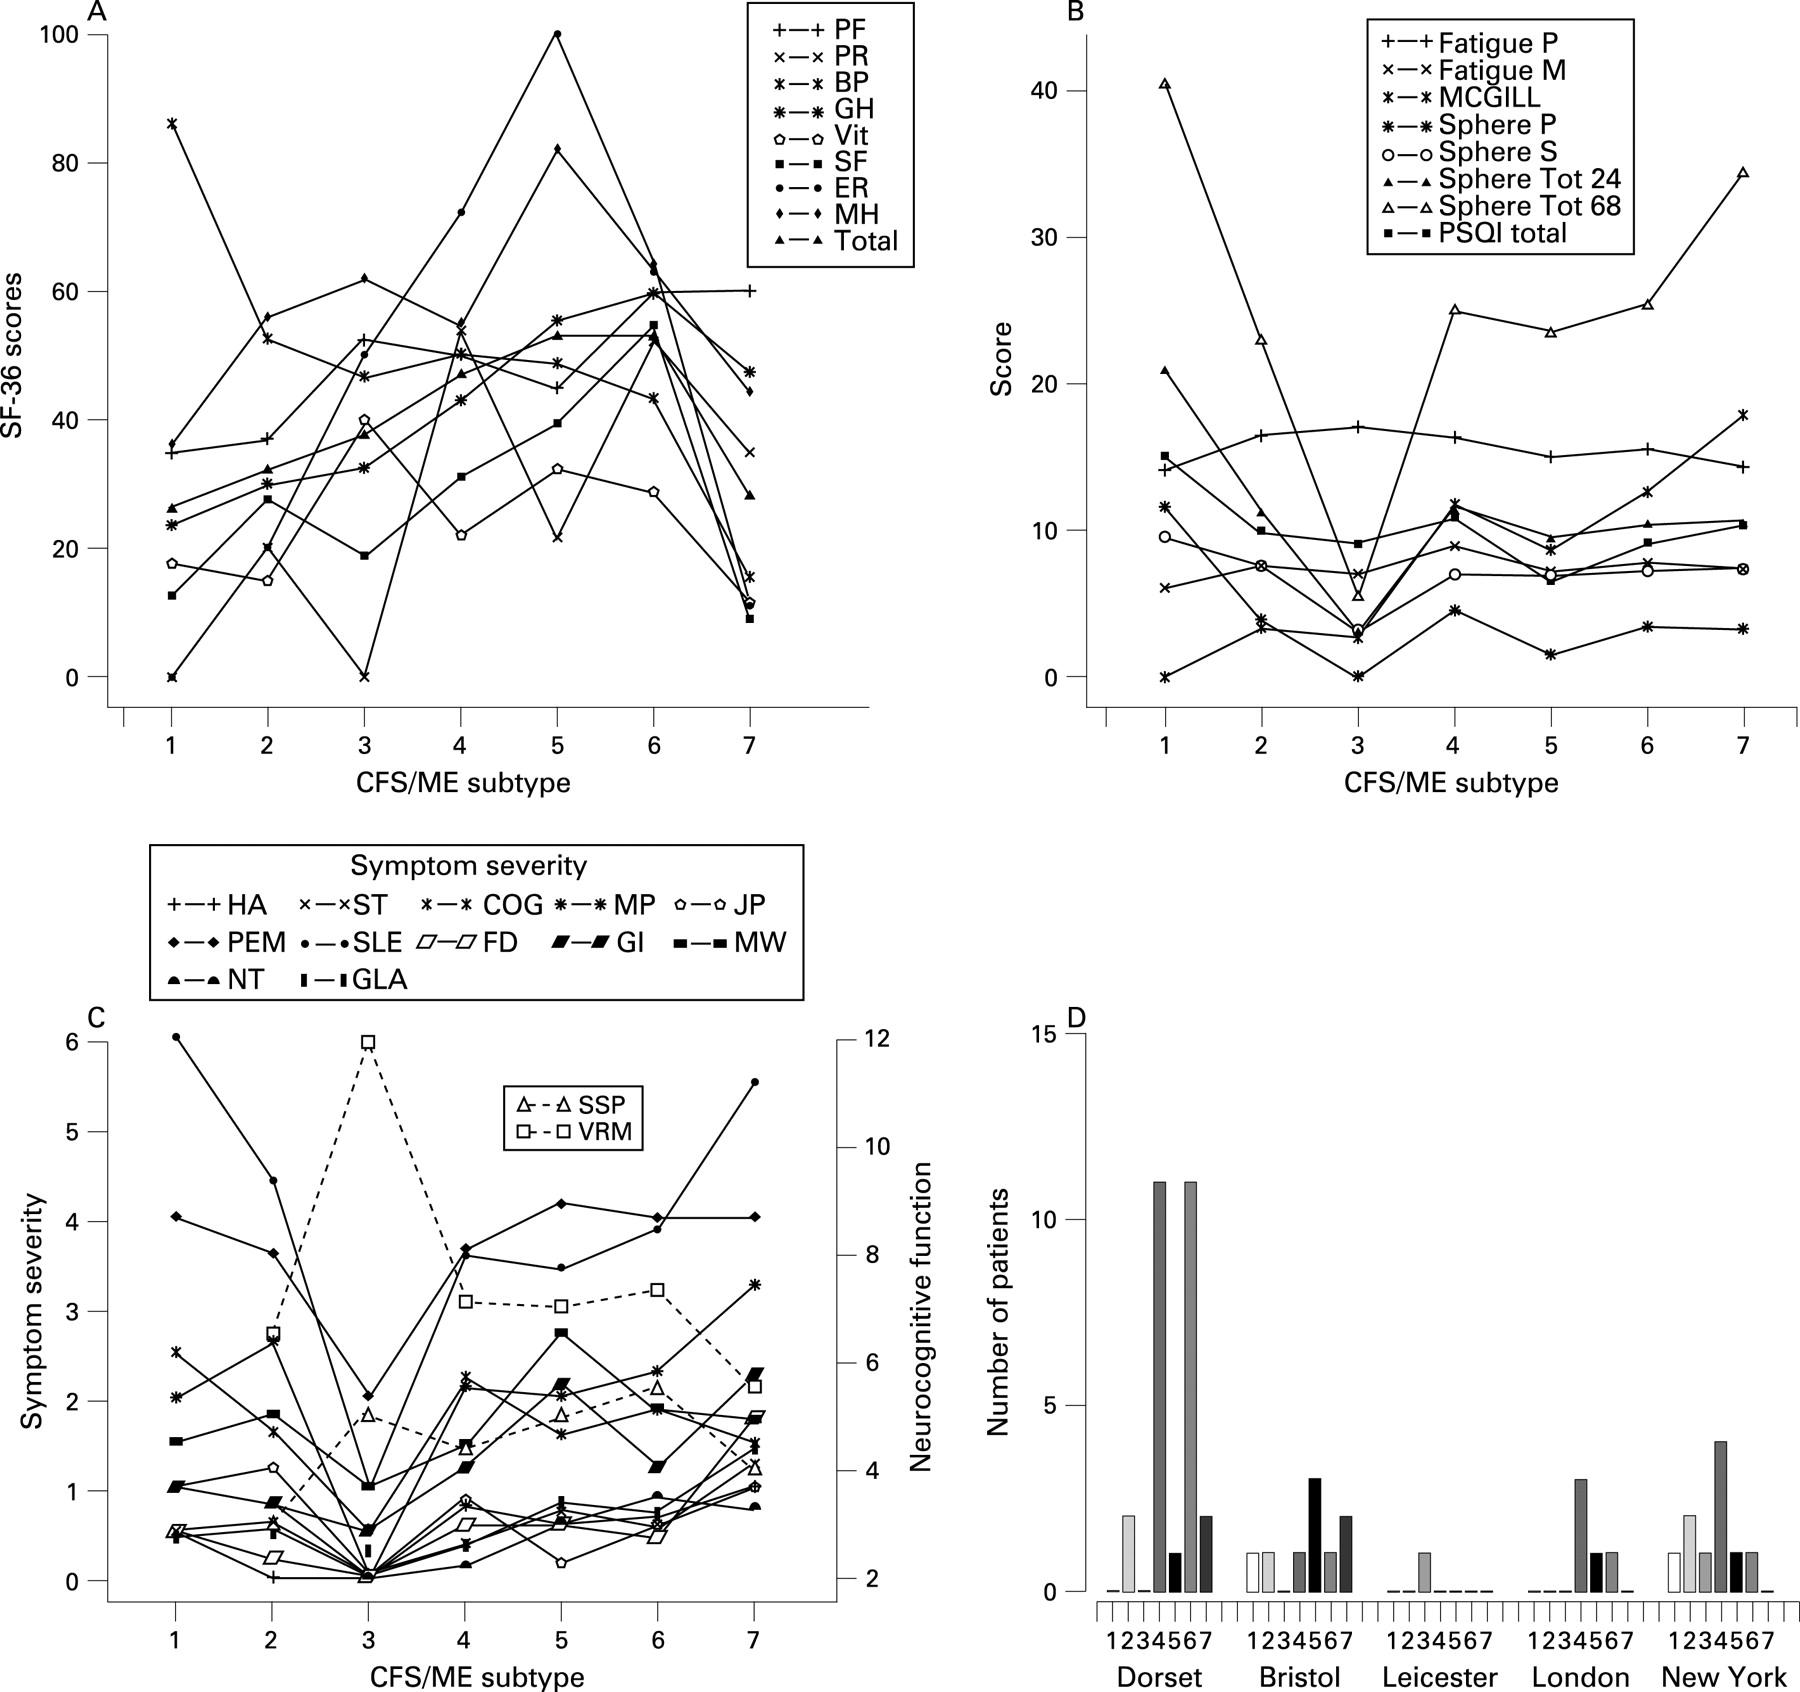 Seven genomic subtypes of chronic fatigue syndrome/myalgic